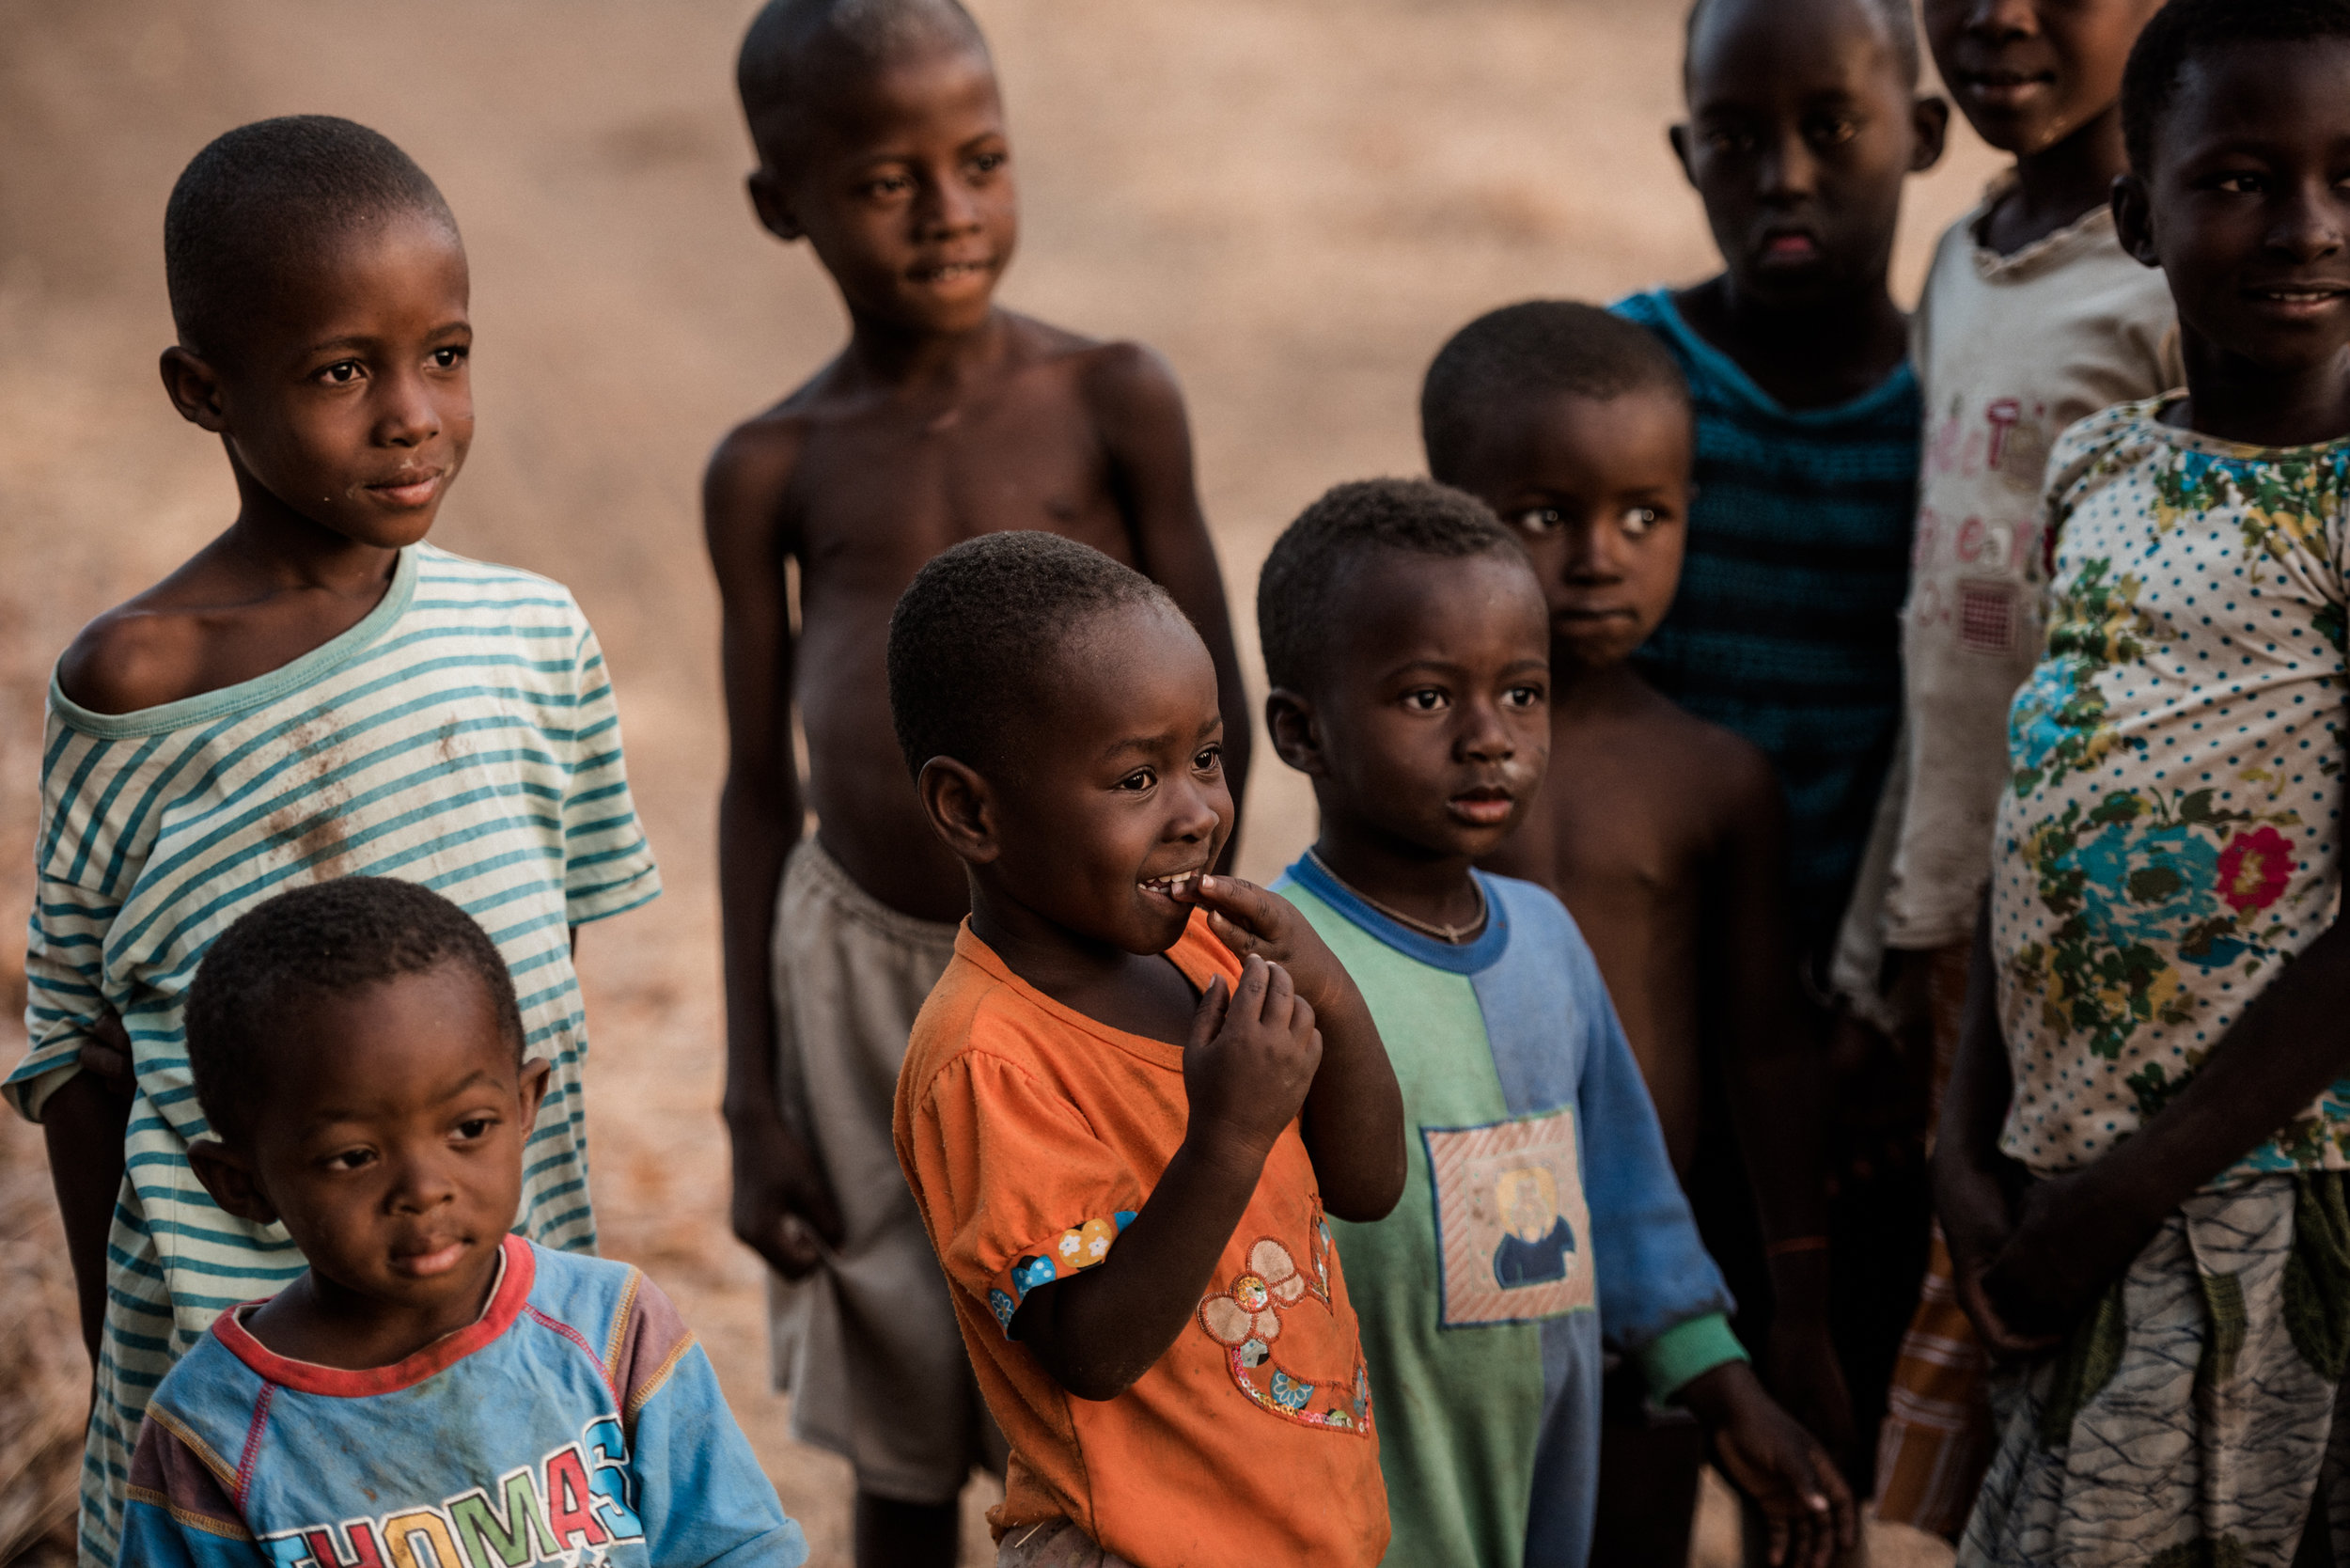 TaraShupe_HumanitarianPhotographer_Woman_Photographer_National_Geographic_Ghana_Women_016.jpg